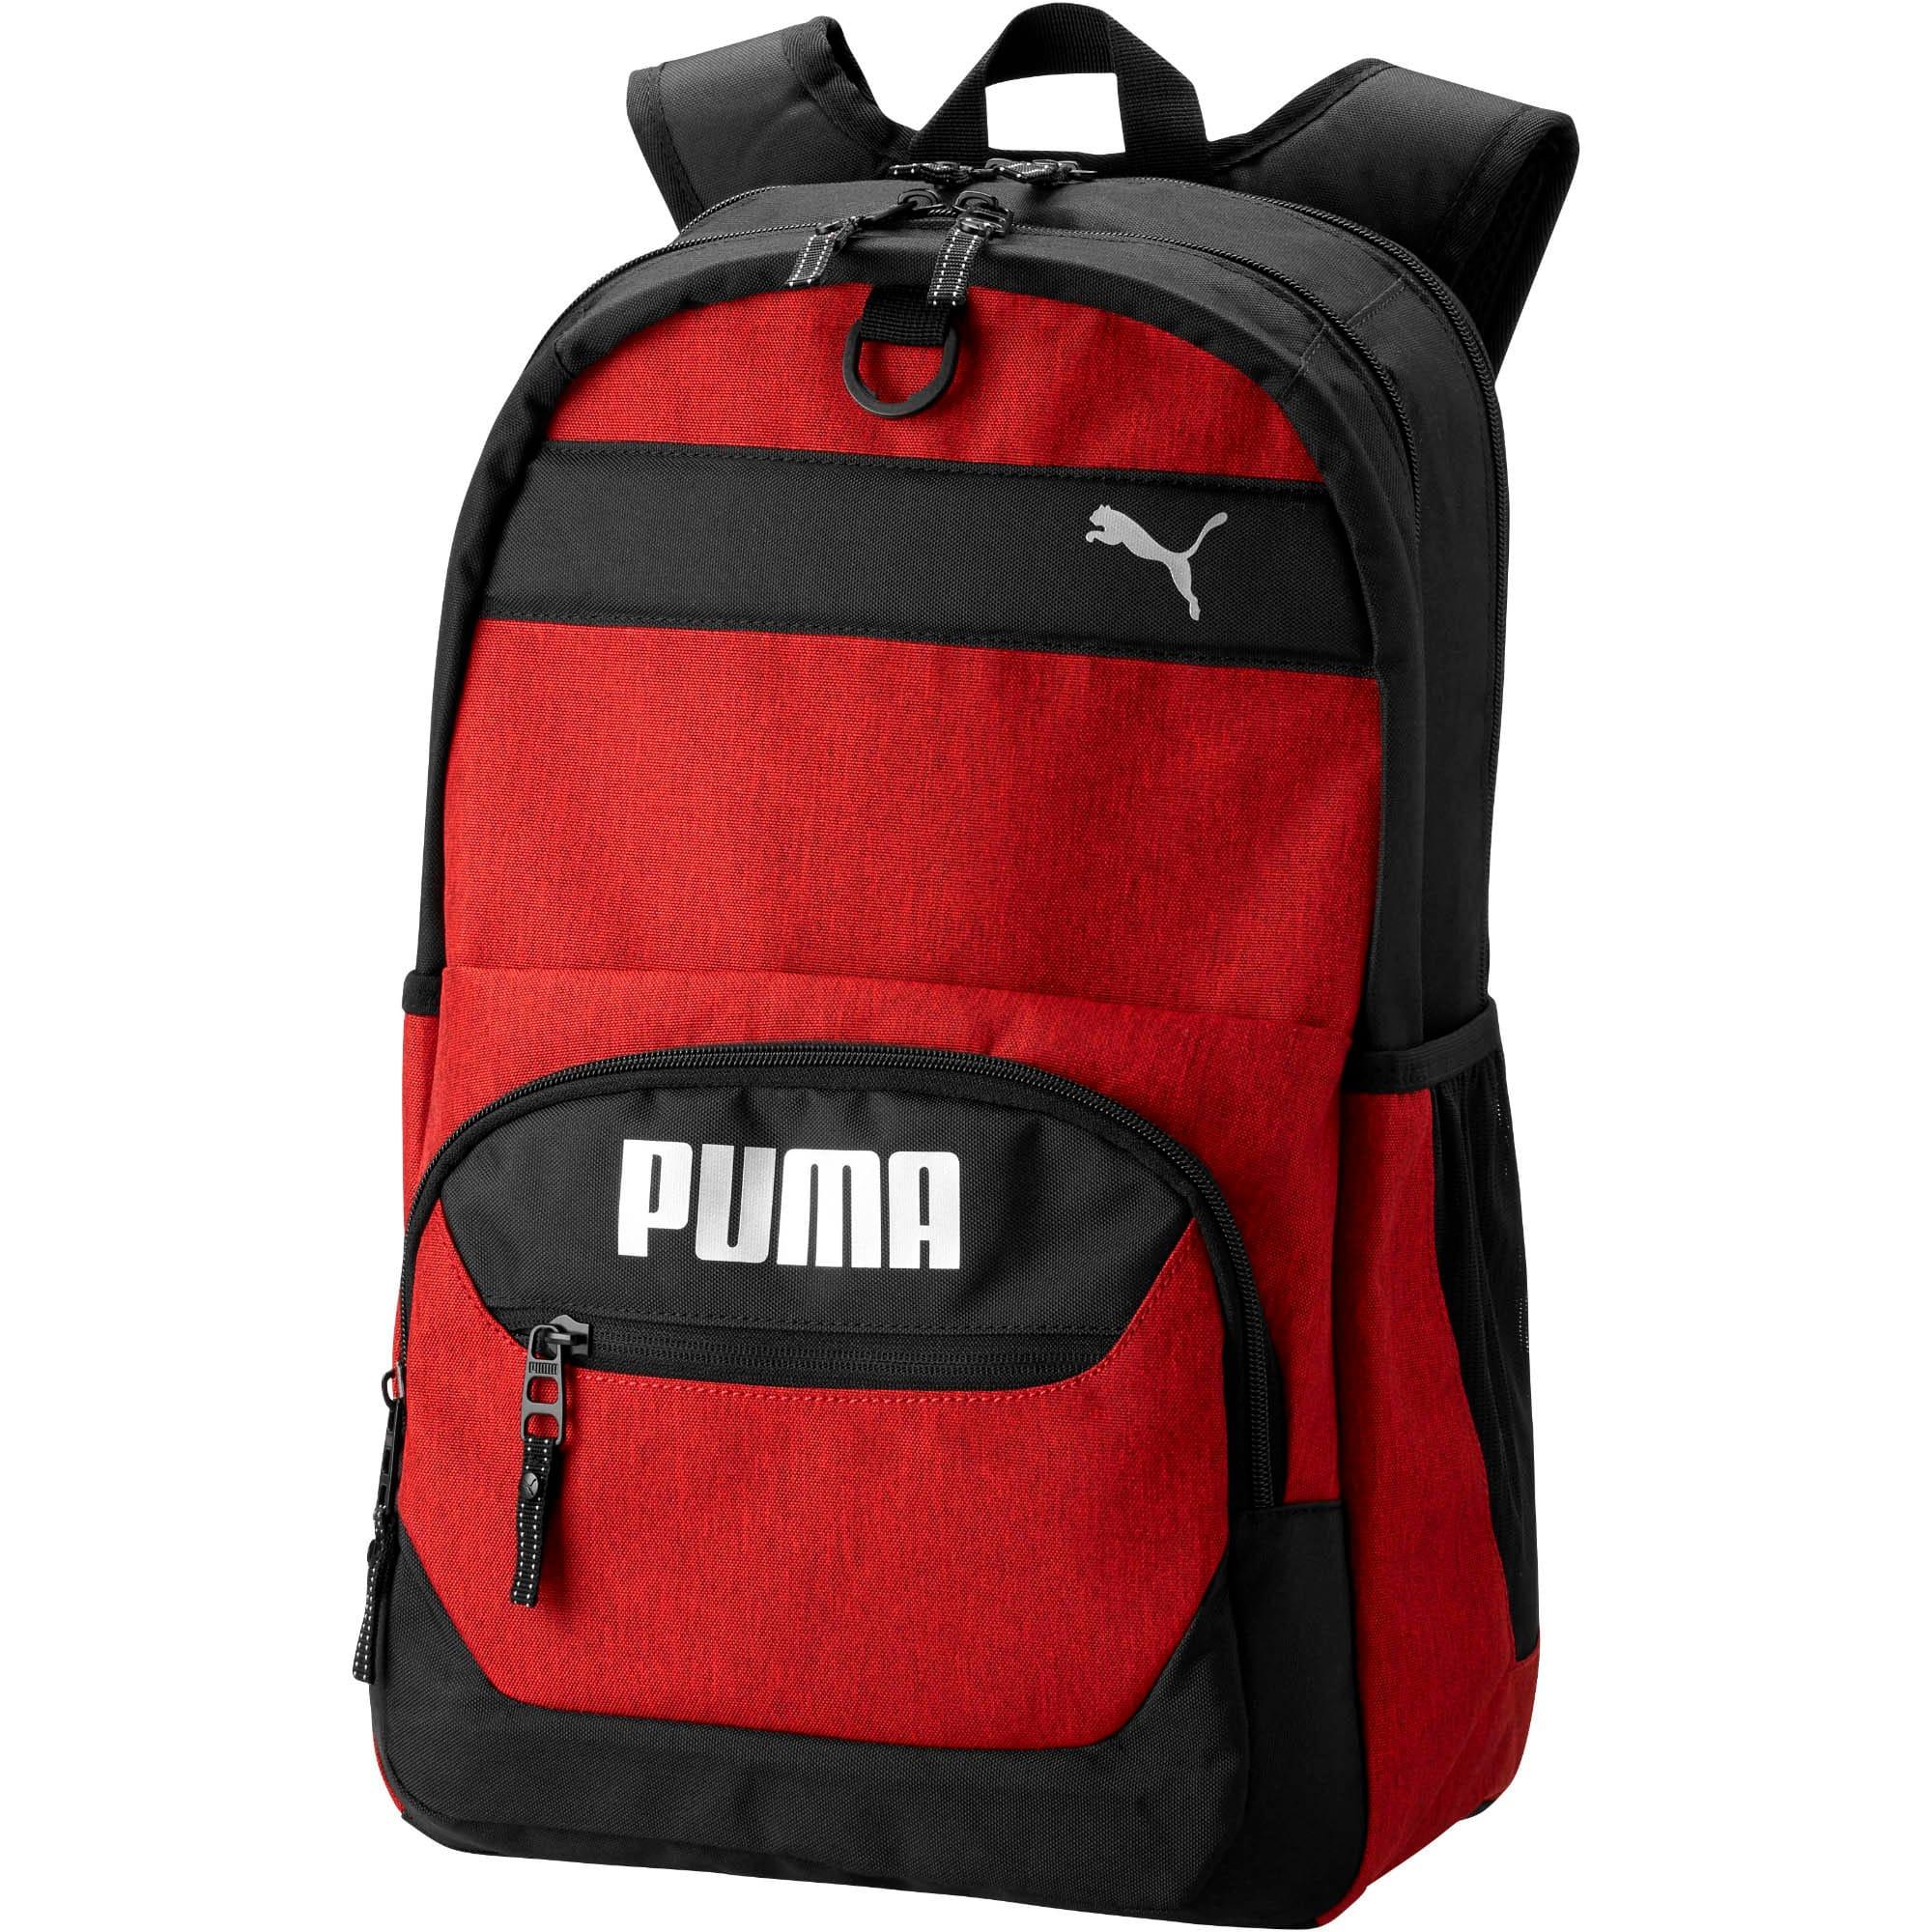 Thumbnail 1 of PUMA Everready Backpack, Red/Black, medium